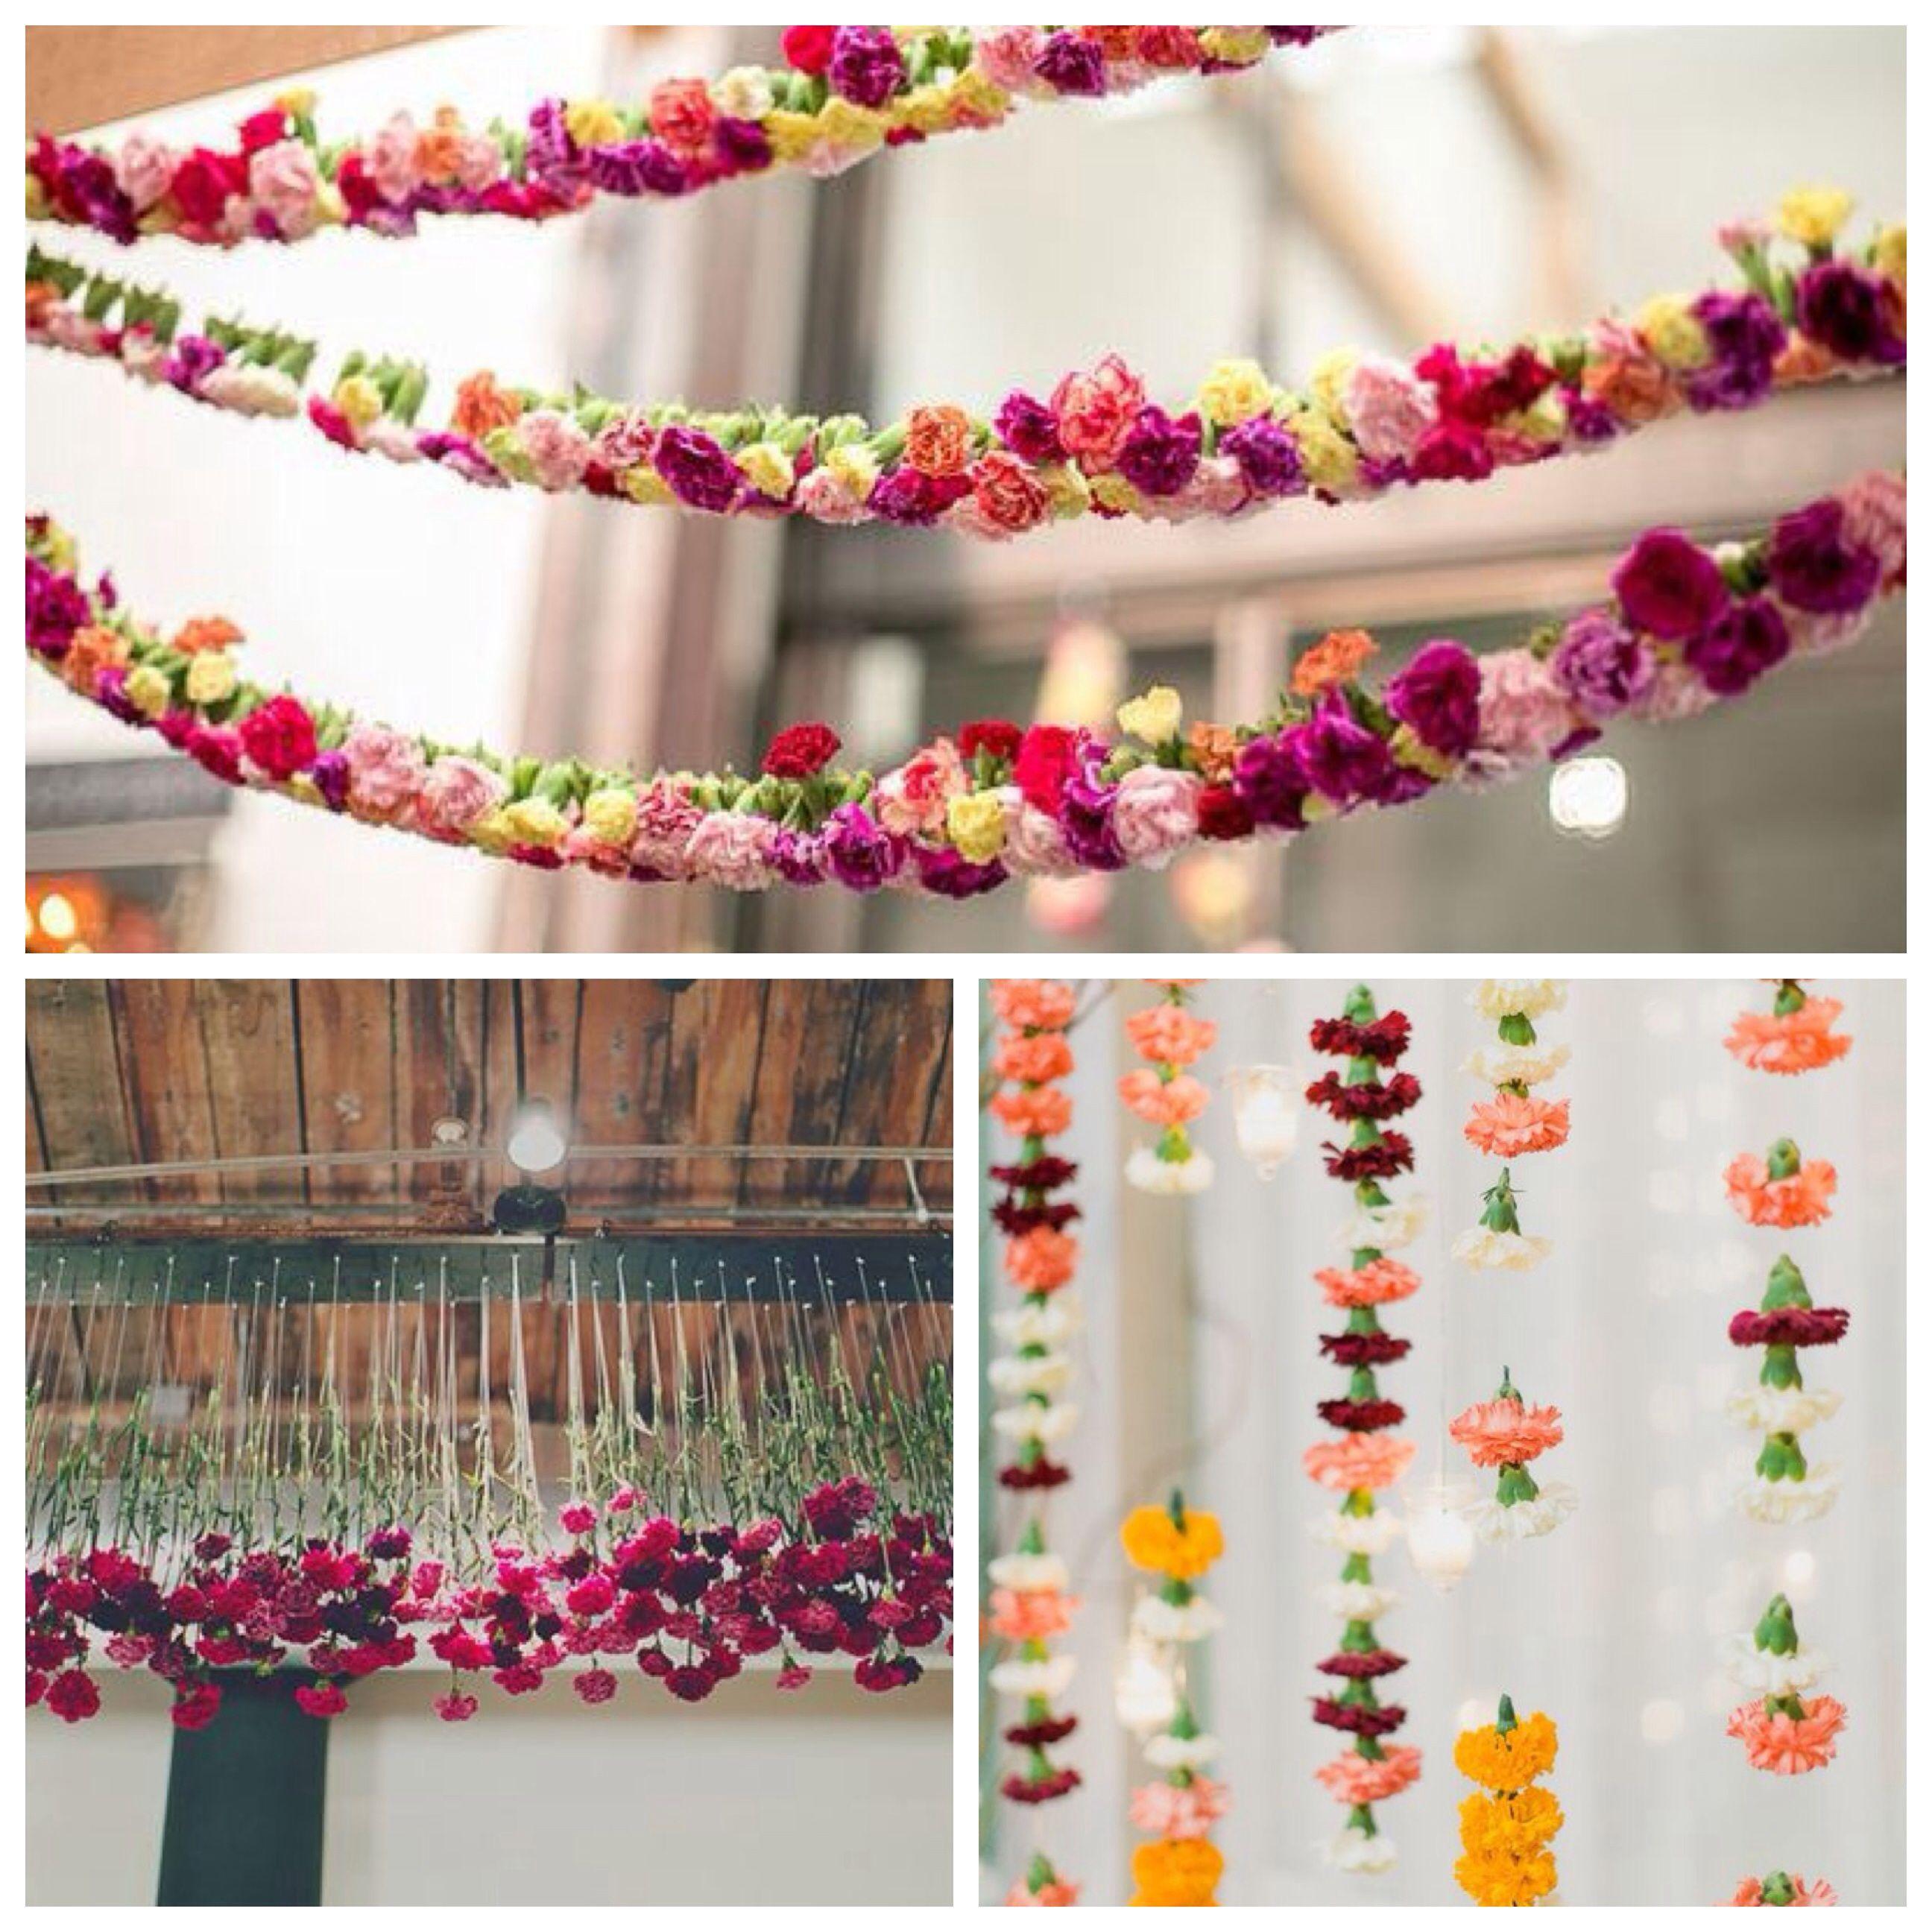 Carnation Wedding Venue Decoration